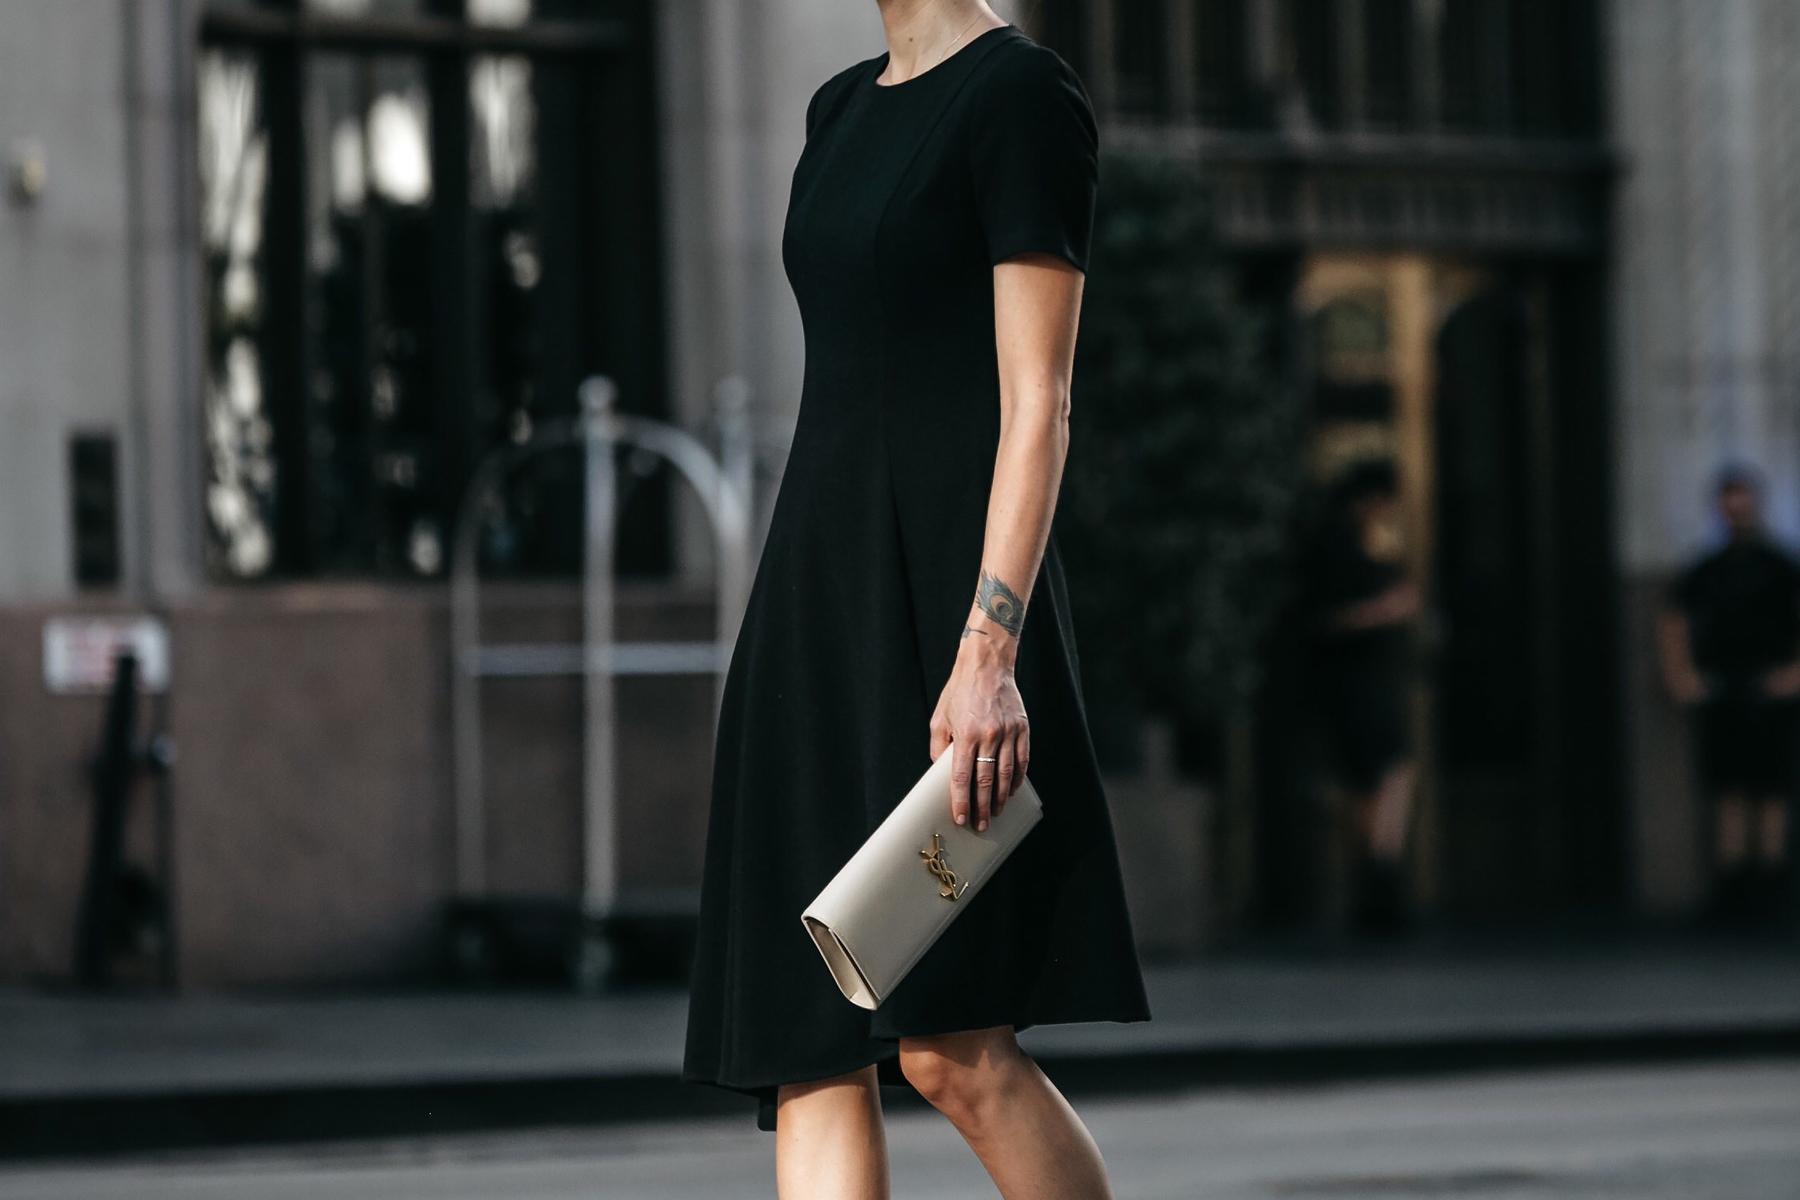 fd26cf1aec3c Black Halo Asymmetrical Little Black Dress Fashion Jackson Dallas Blogger  Fashion Blogger Street Style